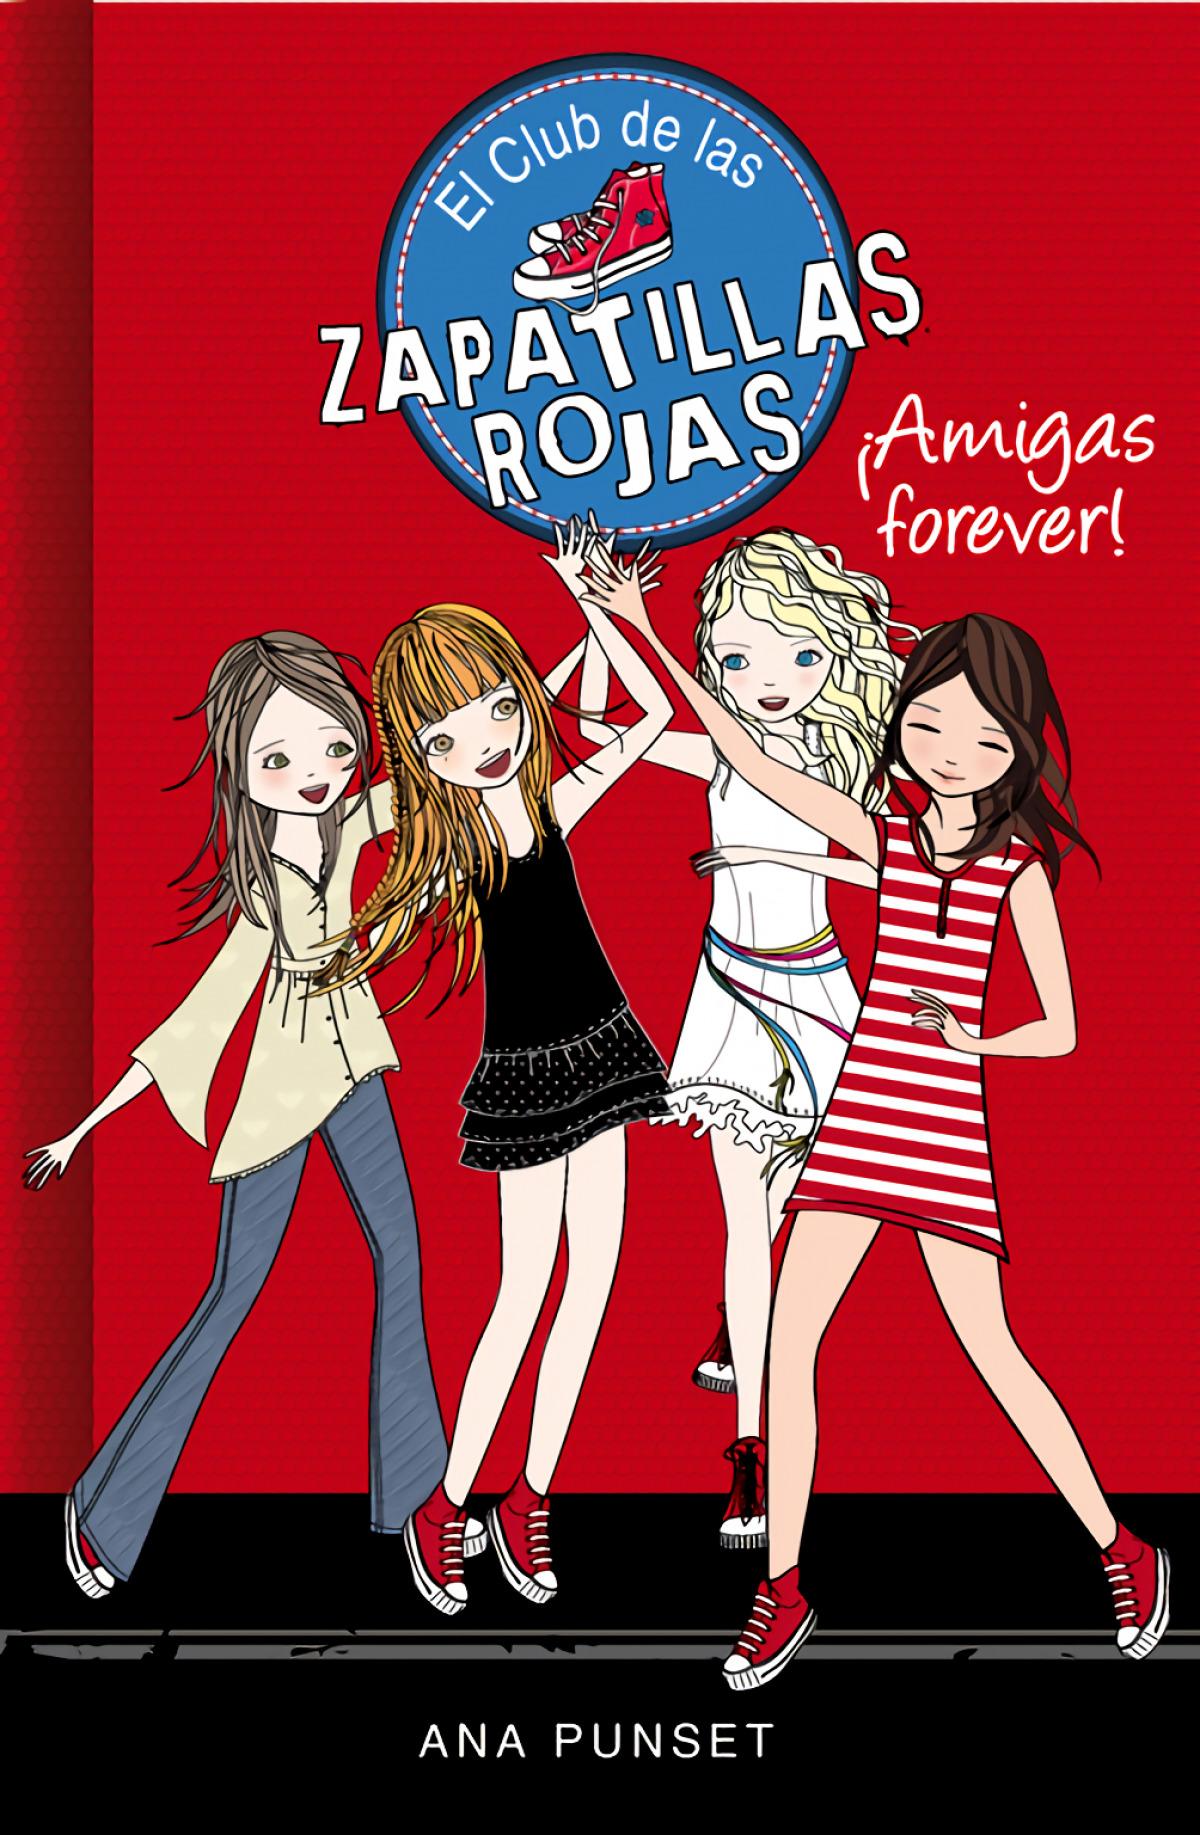 íAmigas forever! 9788415580744